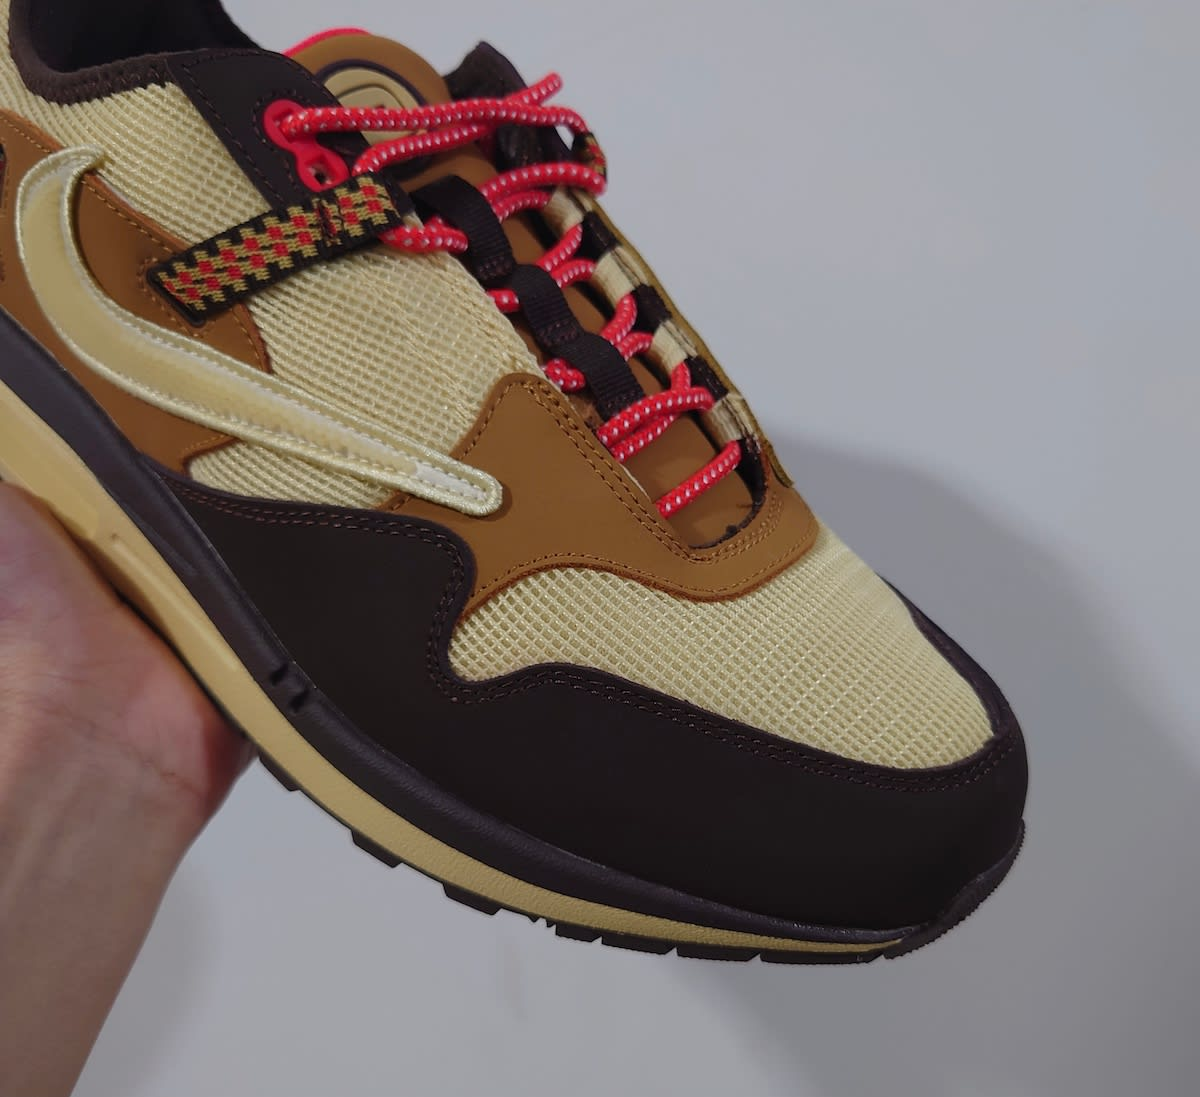 Travis Scott x Nike Air Max 1 Collab Toe